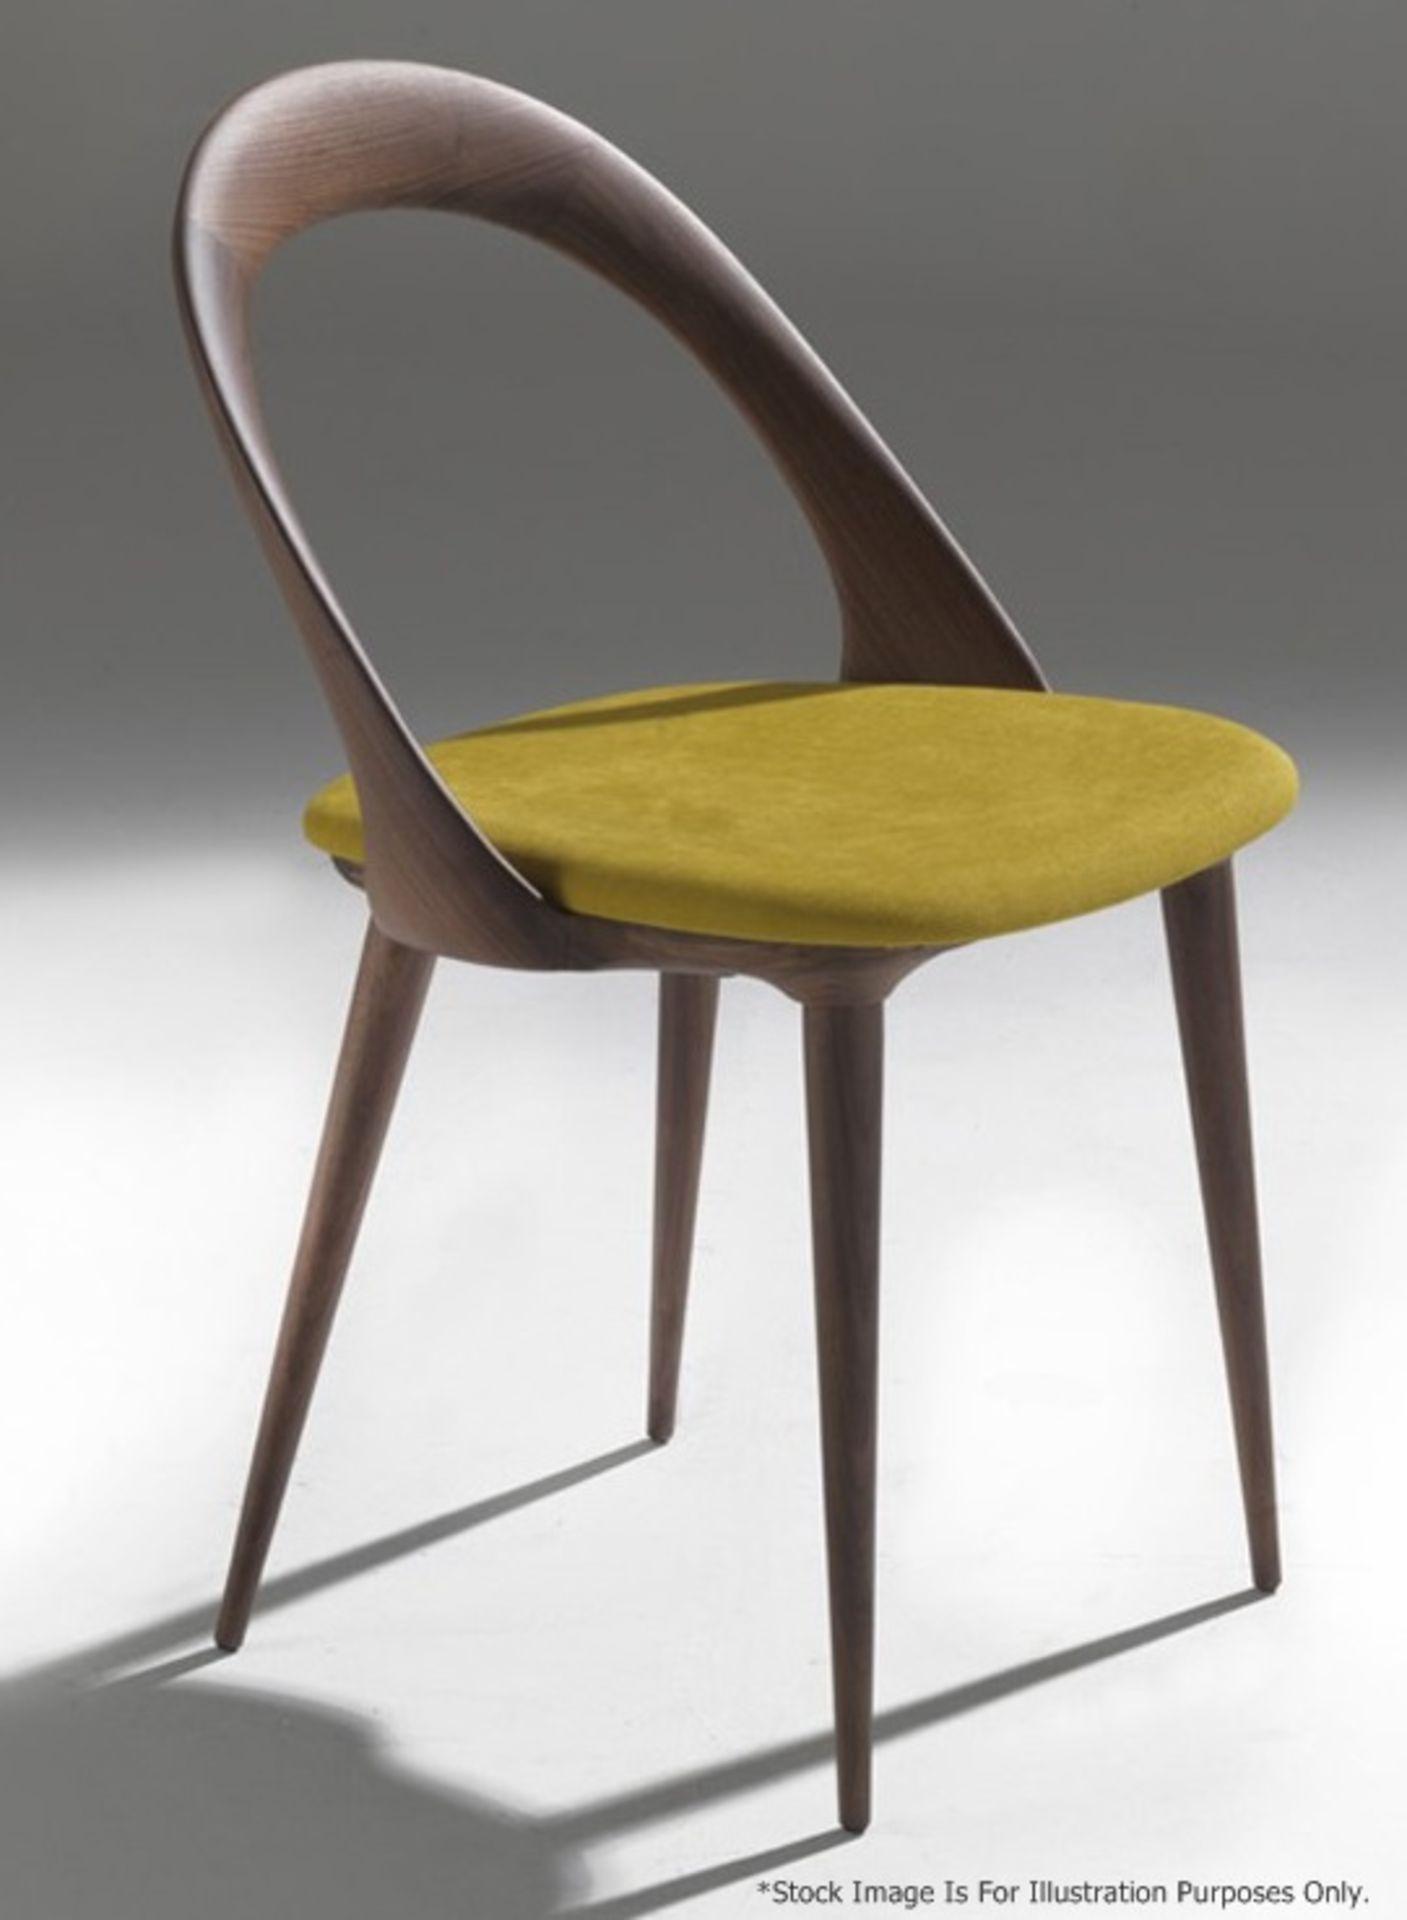 Set Of 4 x PORADA 'Ester' Italian Designer Dining Chairs Featuring Leather Seats - RRP £5,120